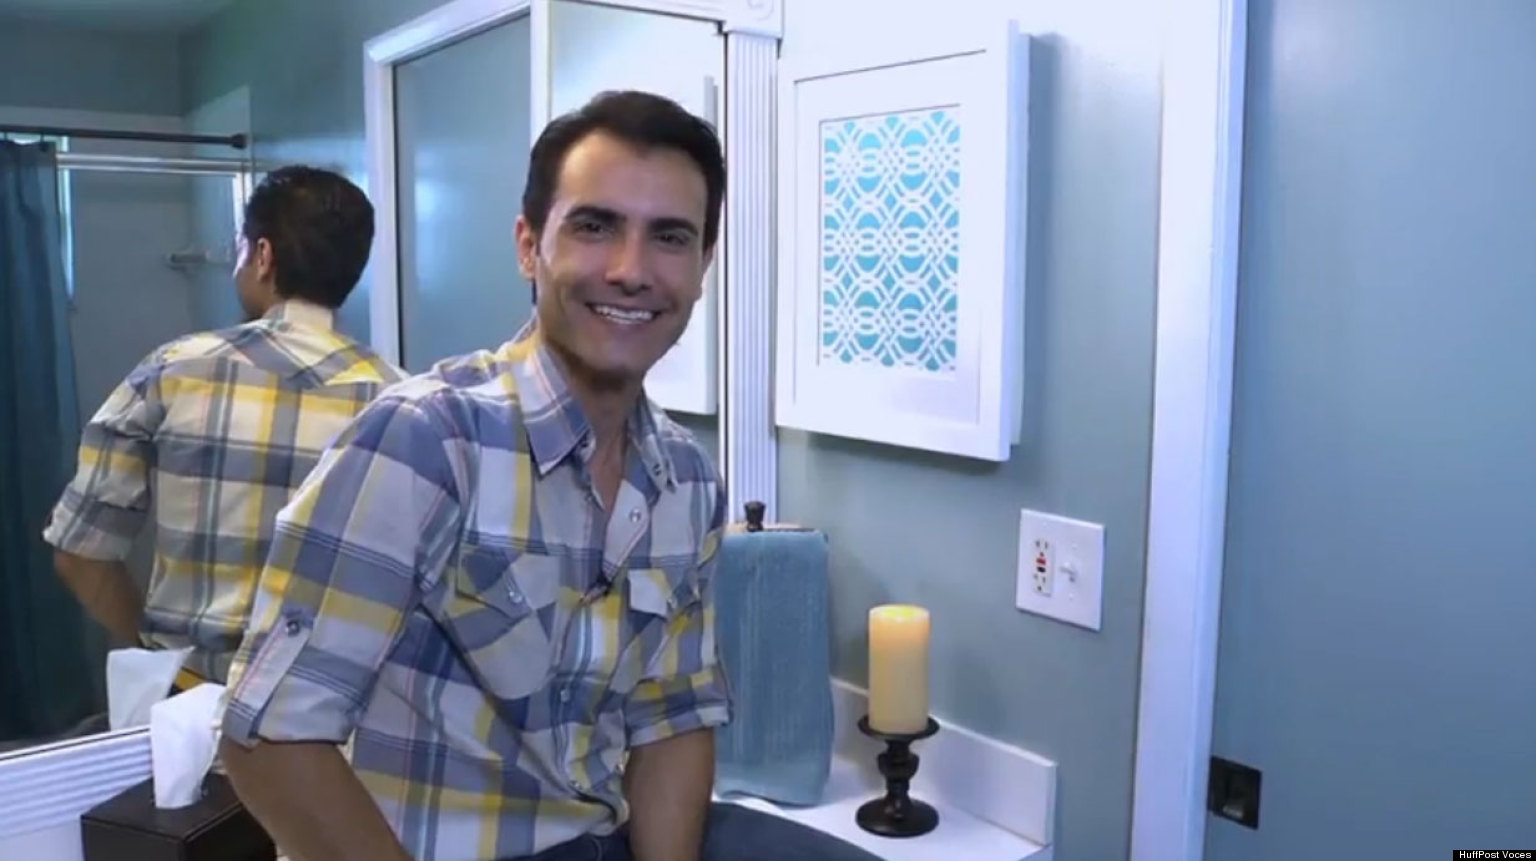 Tipo De Botiquin Para Baño:Transforma tu botiquín en una obra de arte (VIDEO)